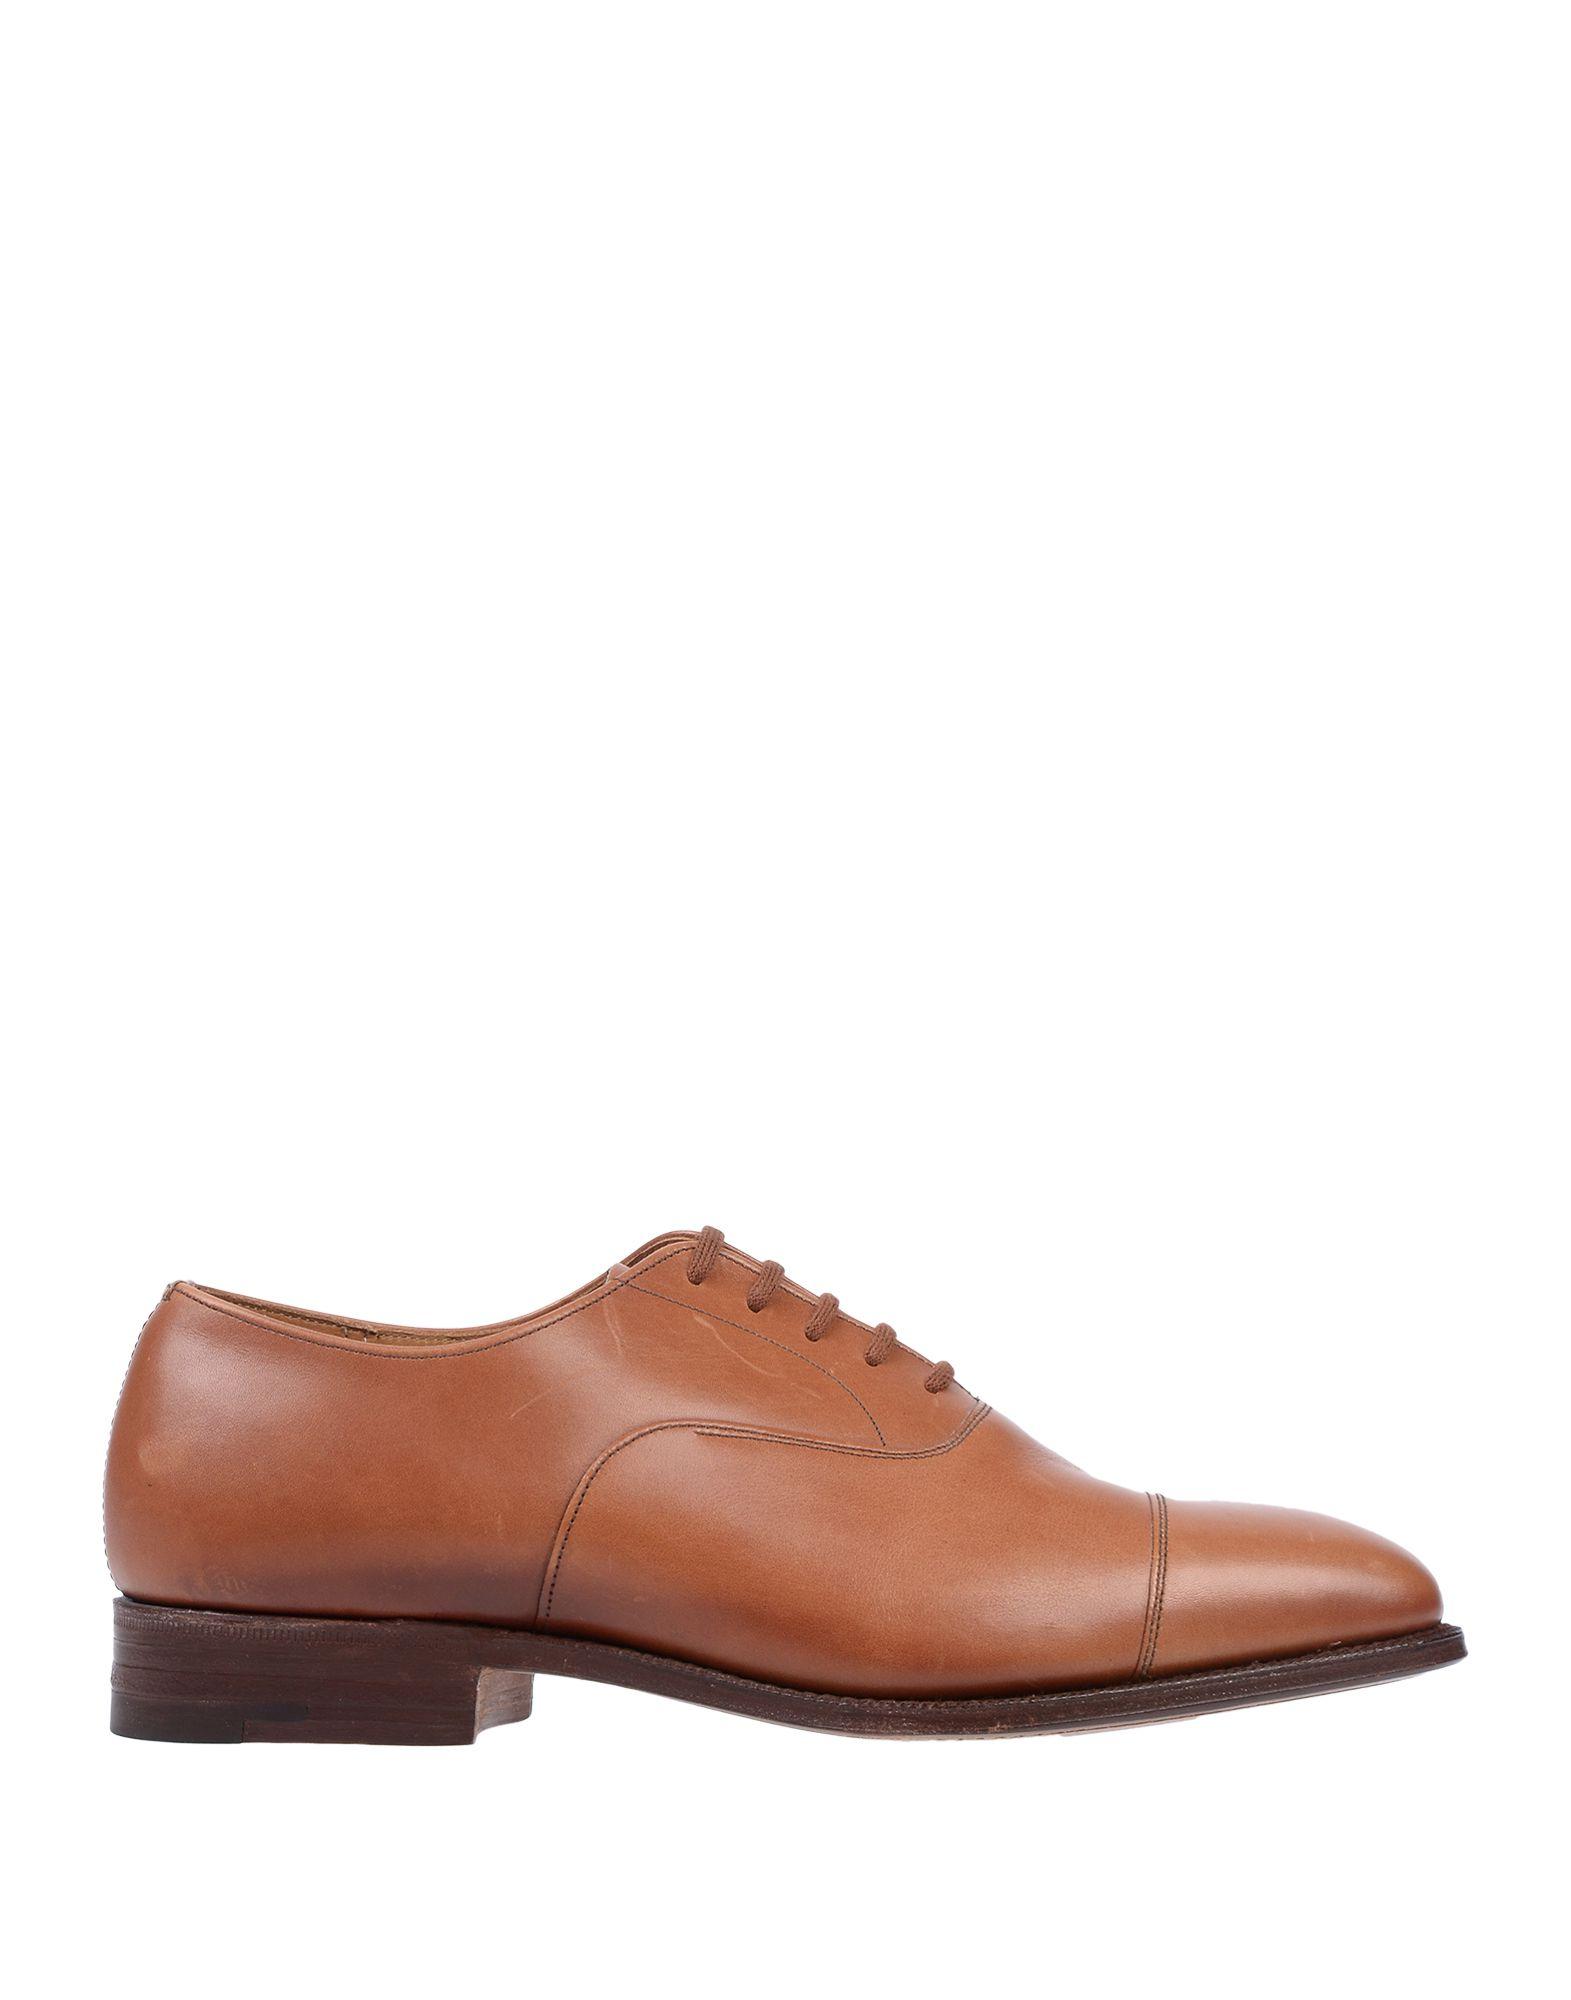 Фото - CHURCH'S Обувь на шнурках обувь на высокой платформе dkny